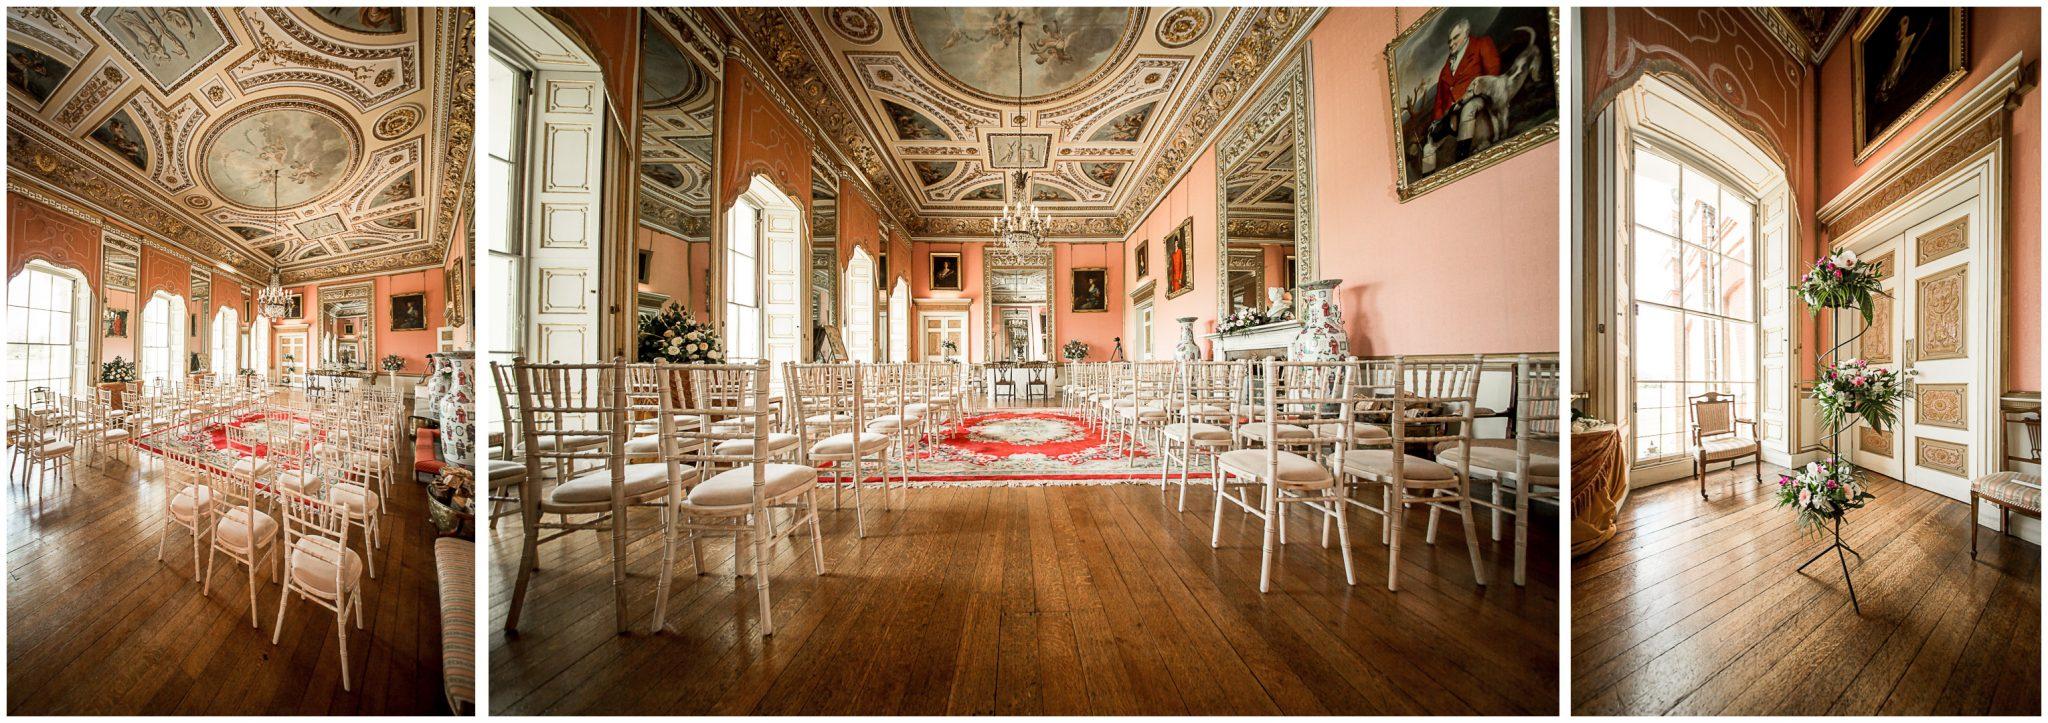 Avington Park wedding photography ceremony room